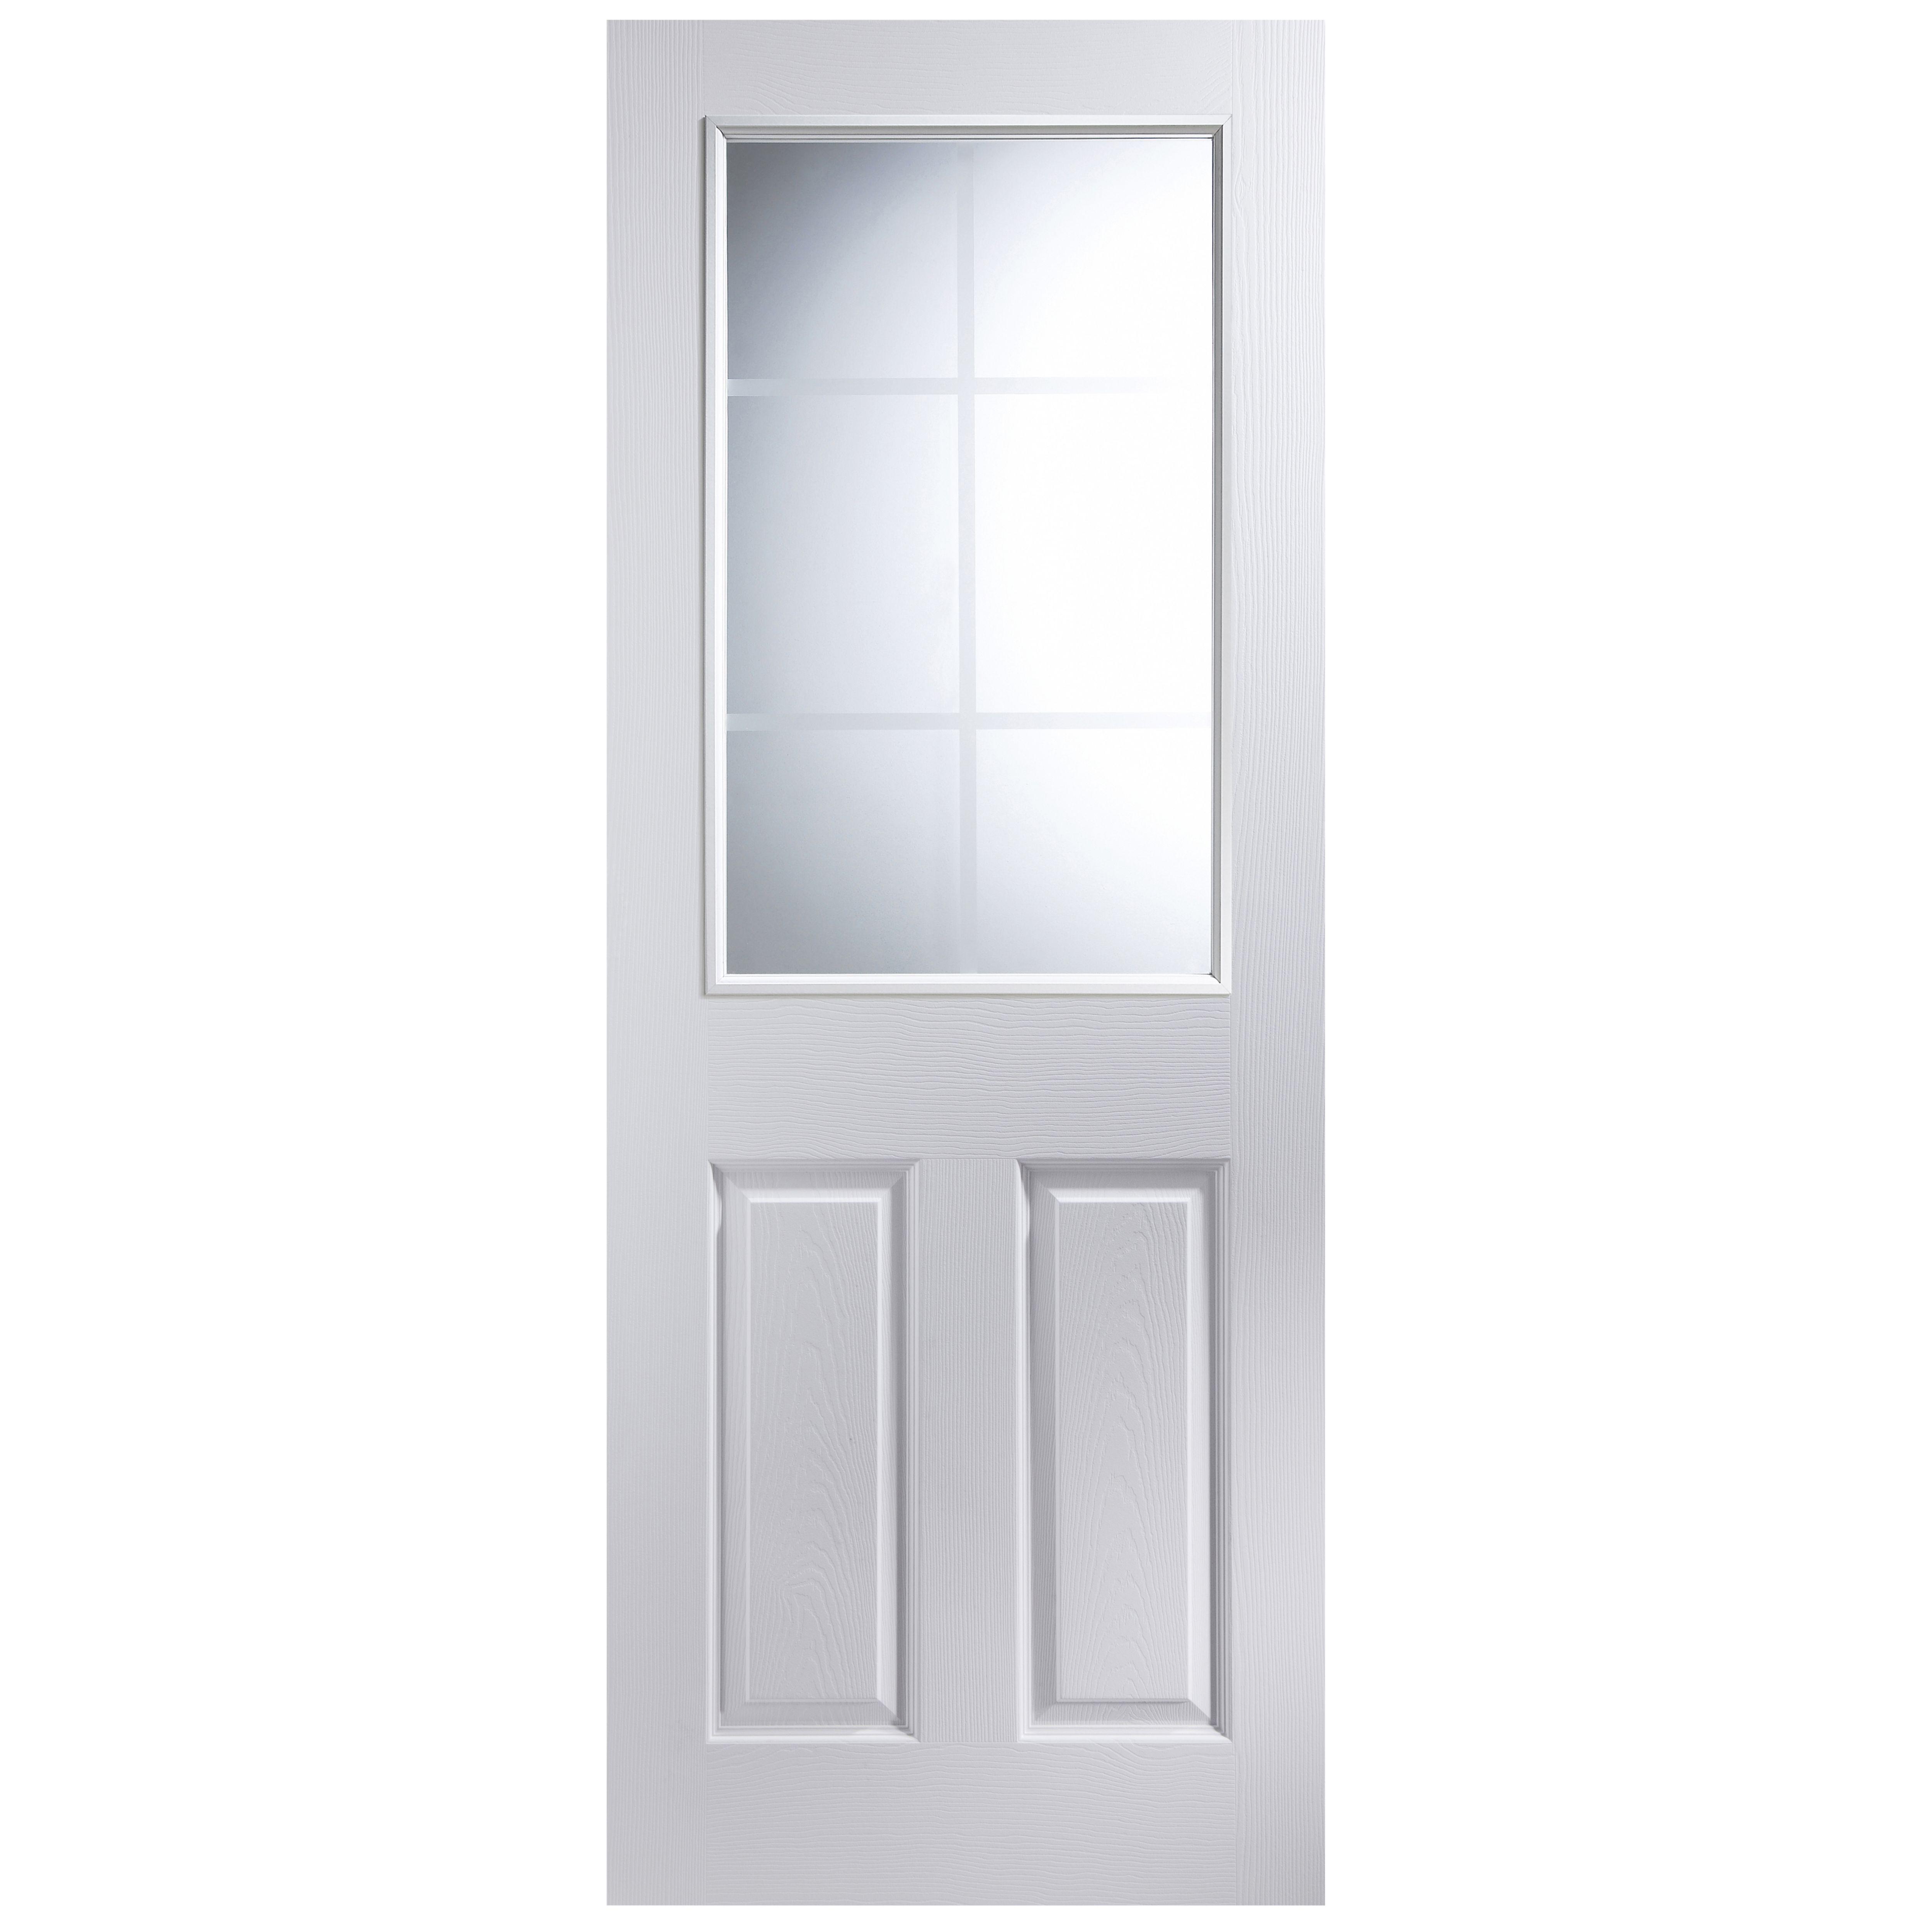 panel pre painted white woodgrain glazed internal door h 1981mm w. Black Bedroom Furniture Sets. Home Design Ideas